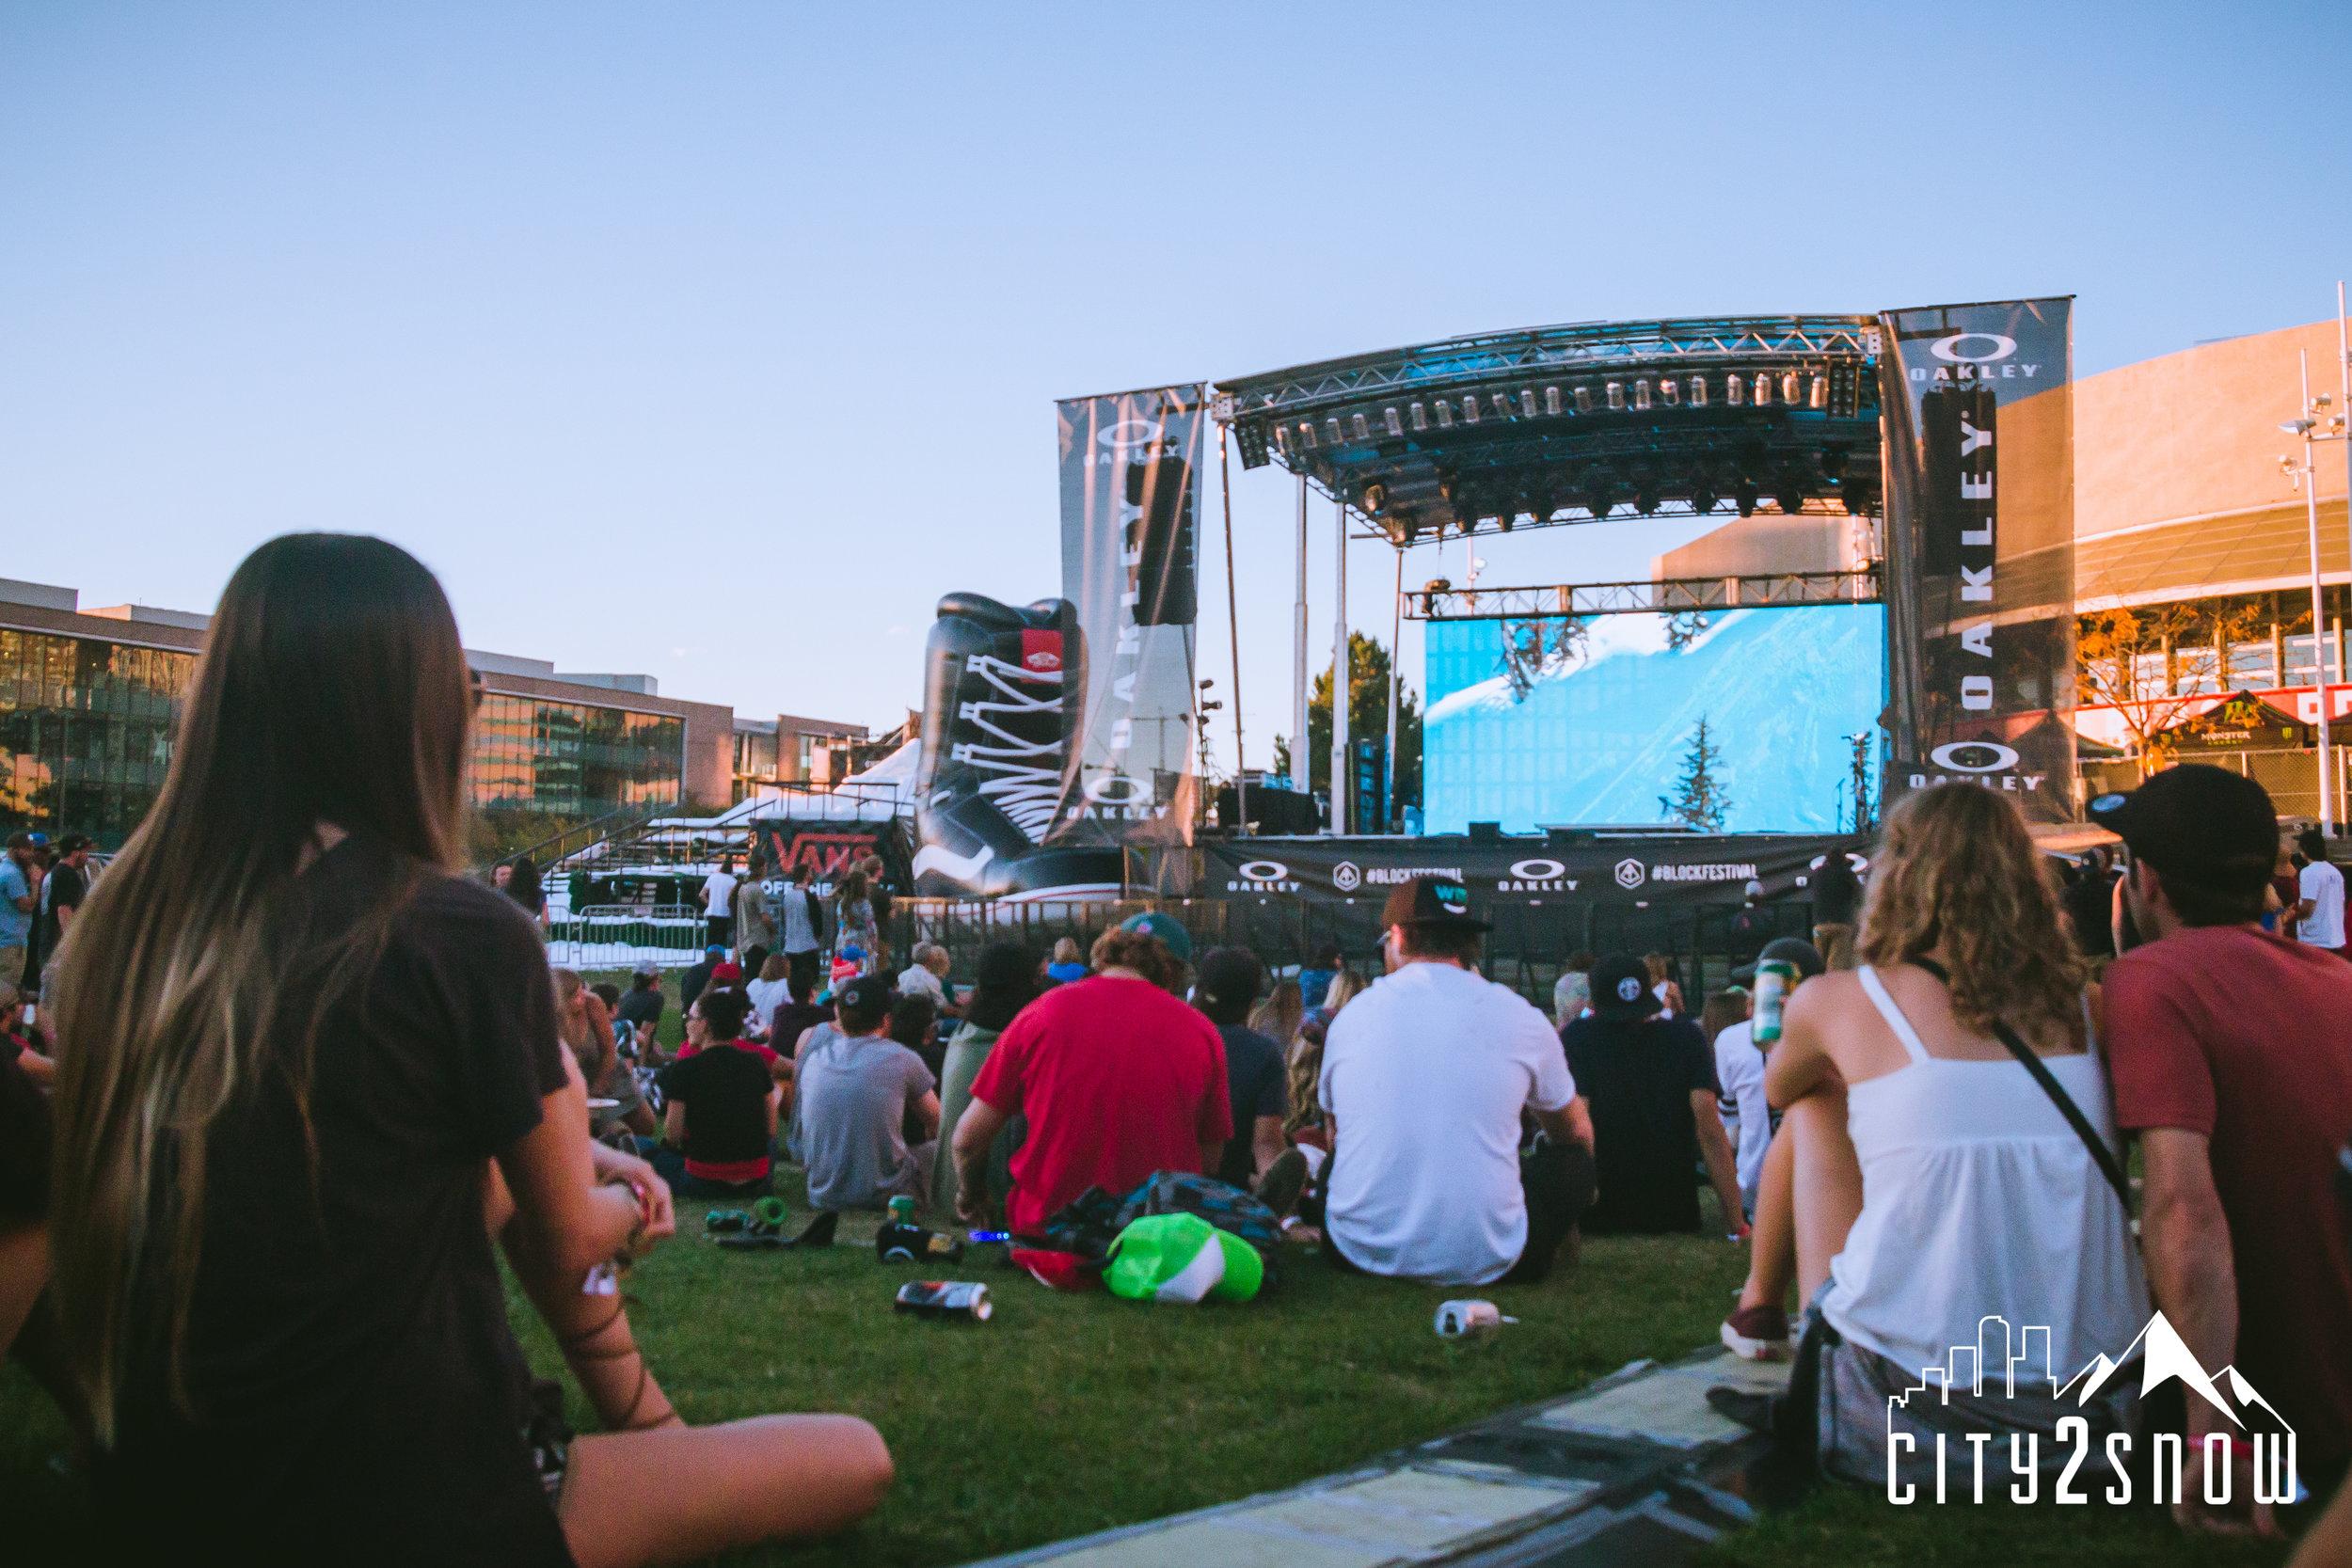 blockfestival-day2-2.jpg